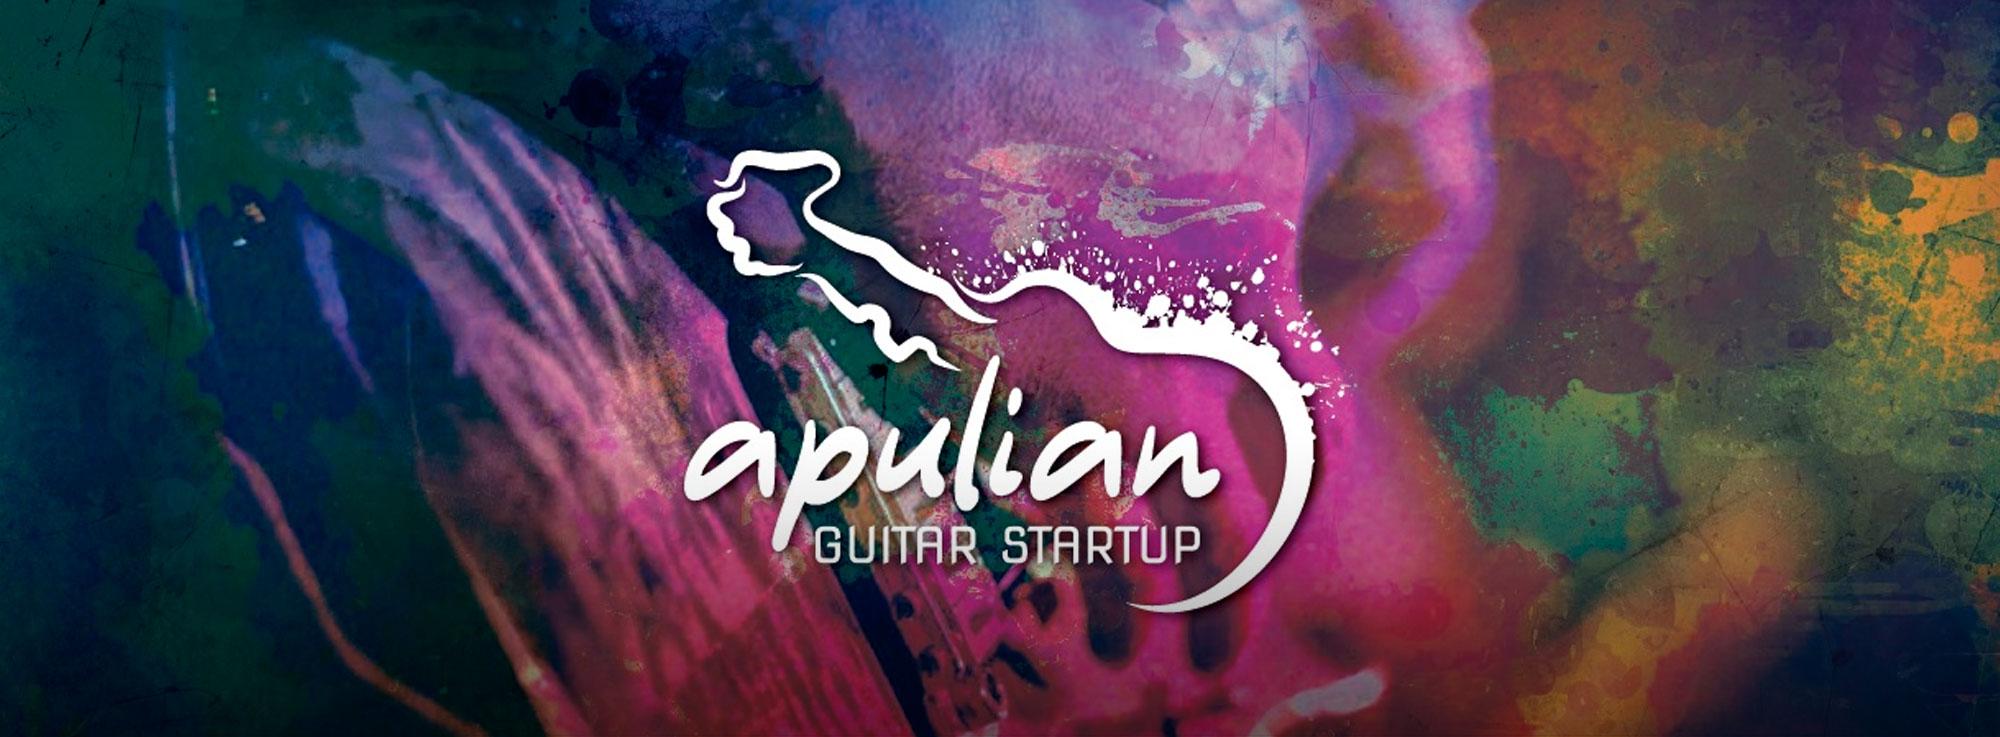 Foggia: Apulian Guitar Startup